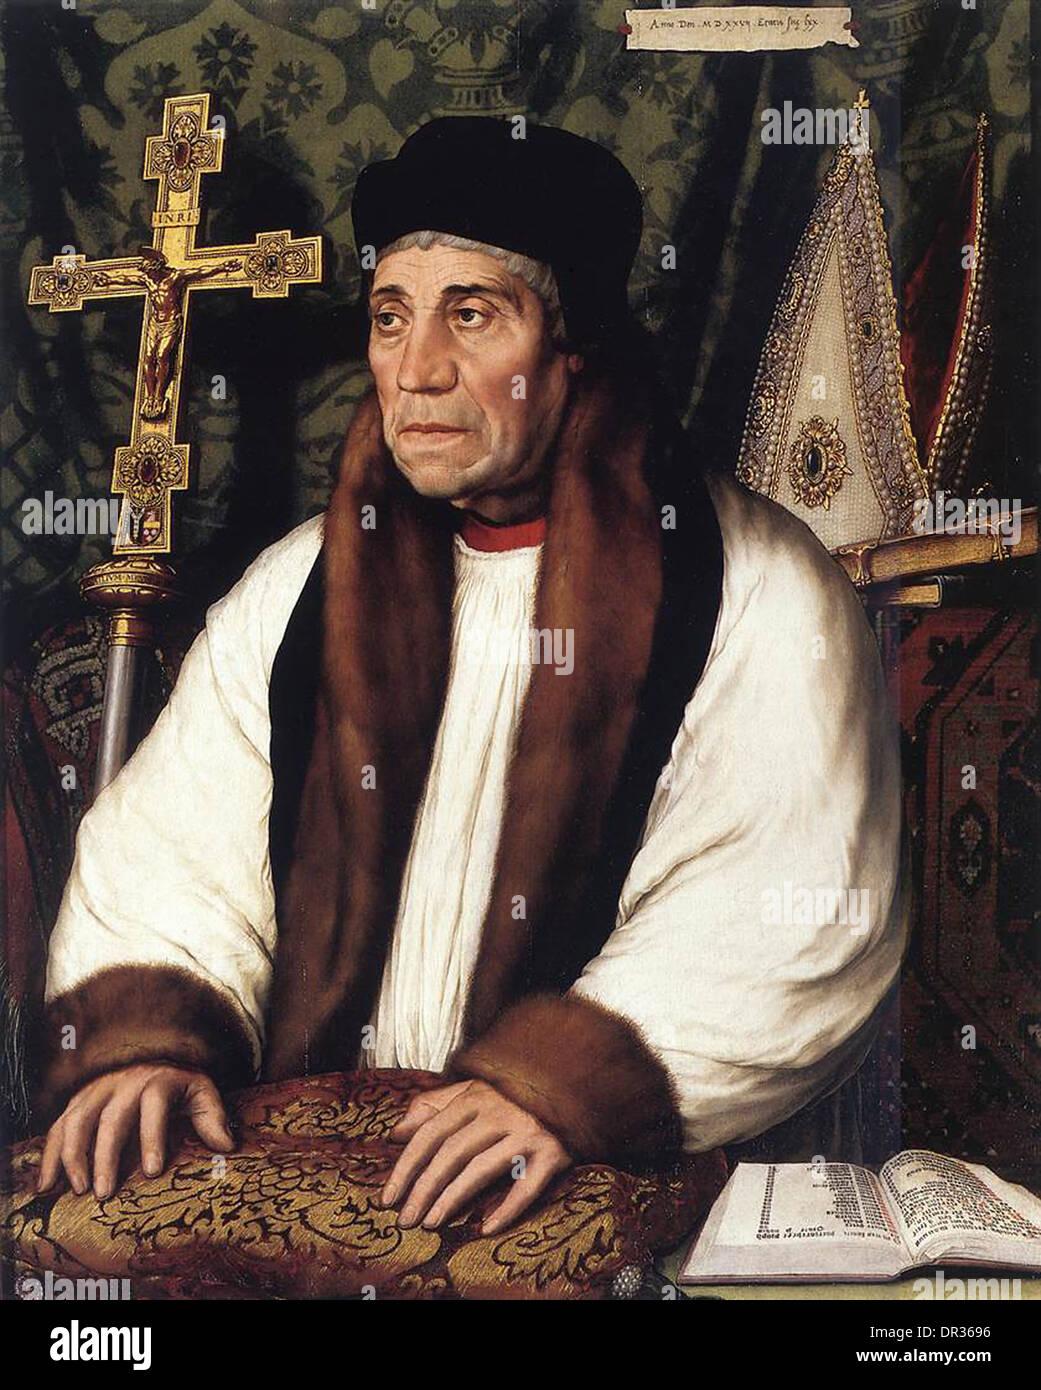 William Warham, Archbishop of Canterbury from 1503 to 1532 - Stock Image